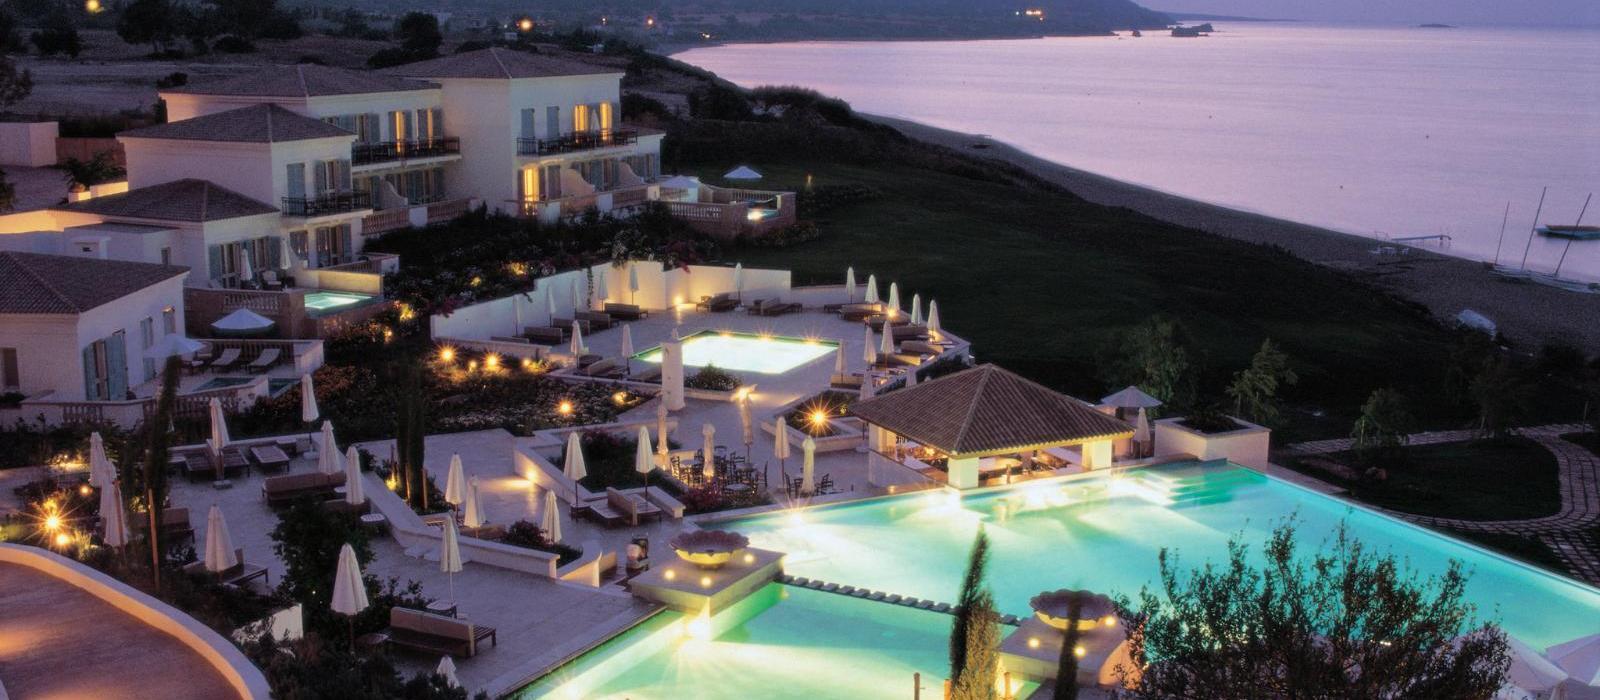 阿纳萨皇家酒店(Anassa) 图片  www.lhw.cn